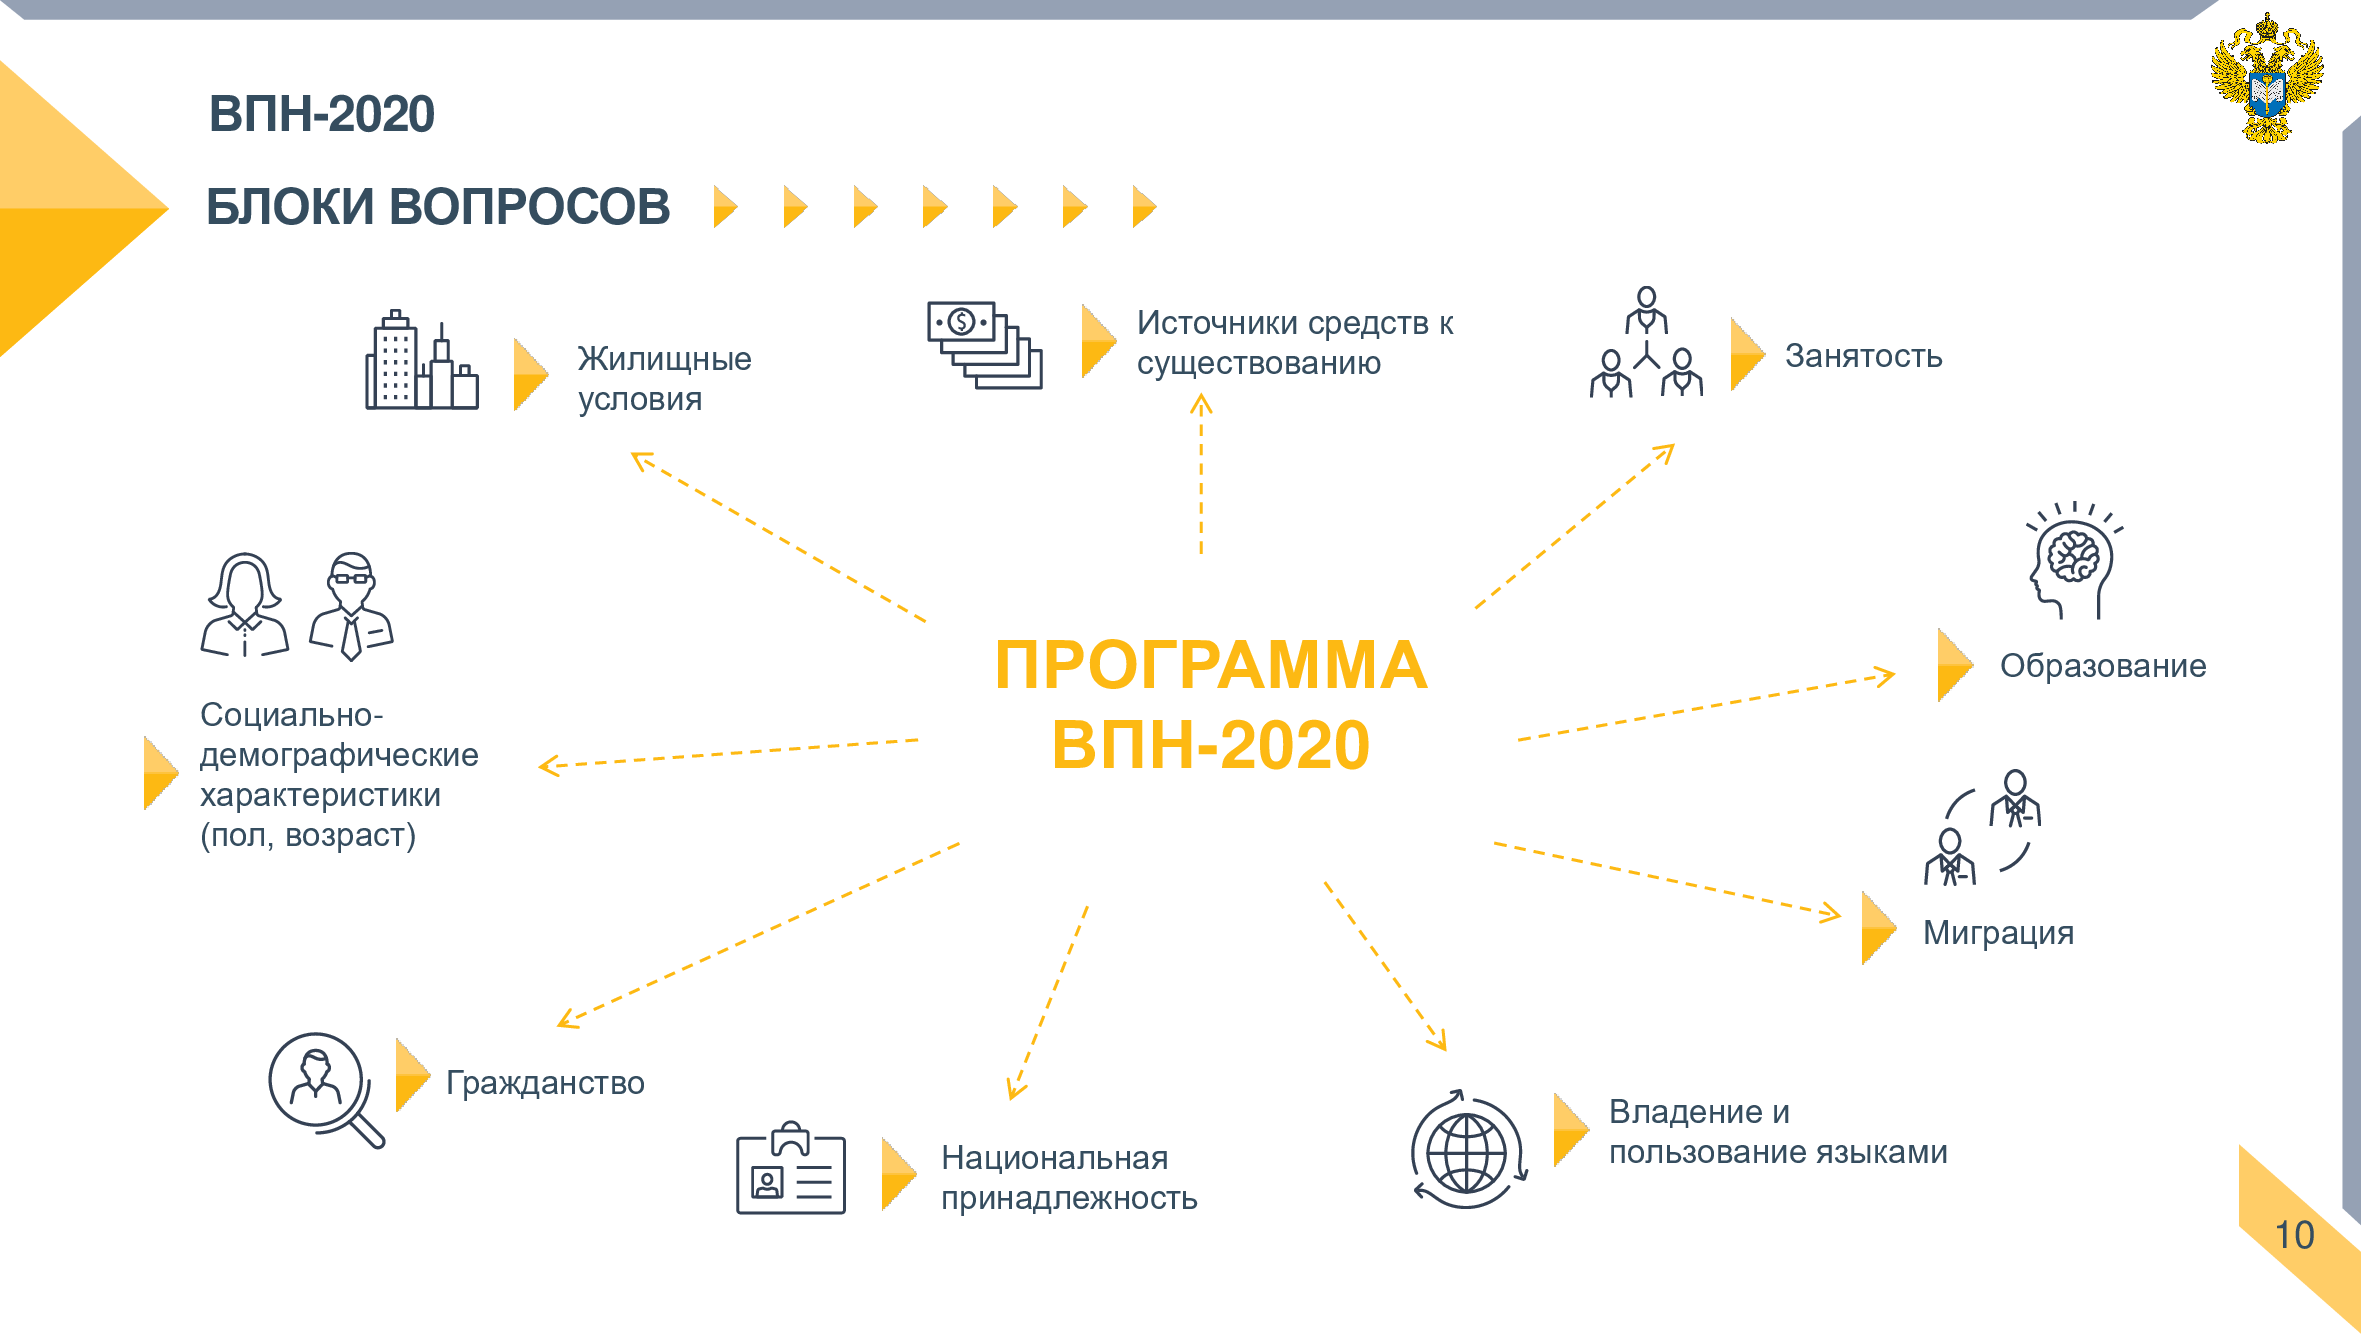 Программа ВПН 2020